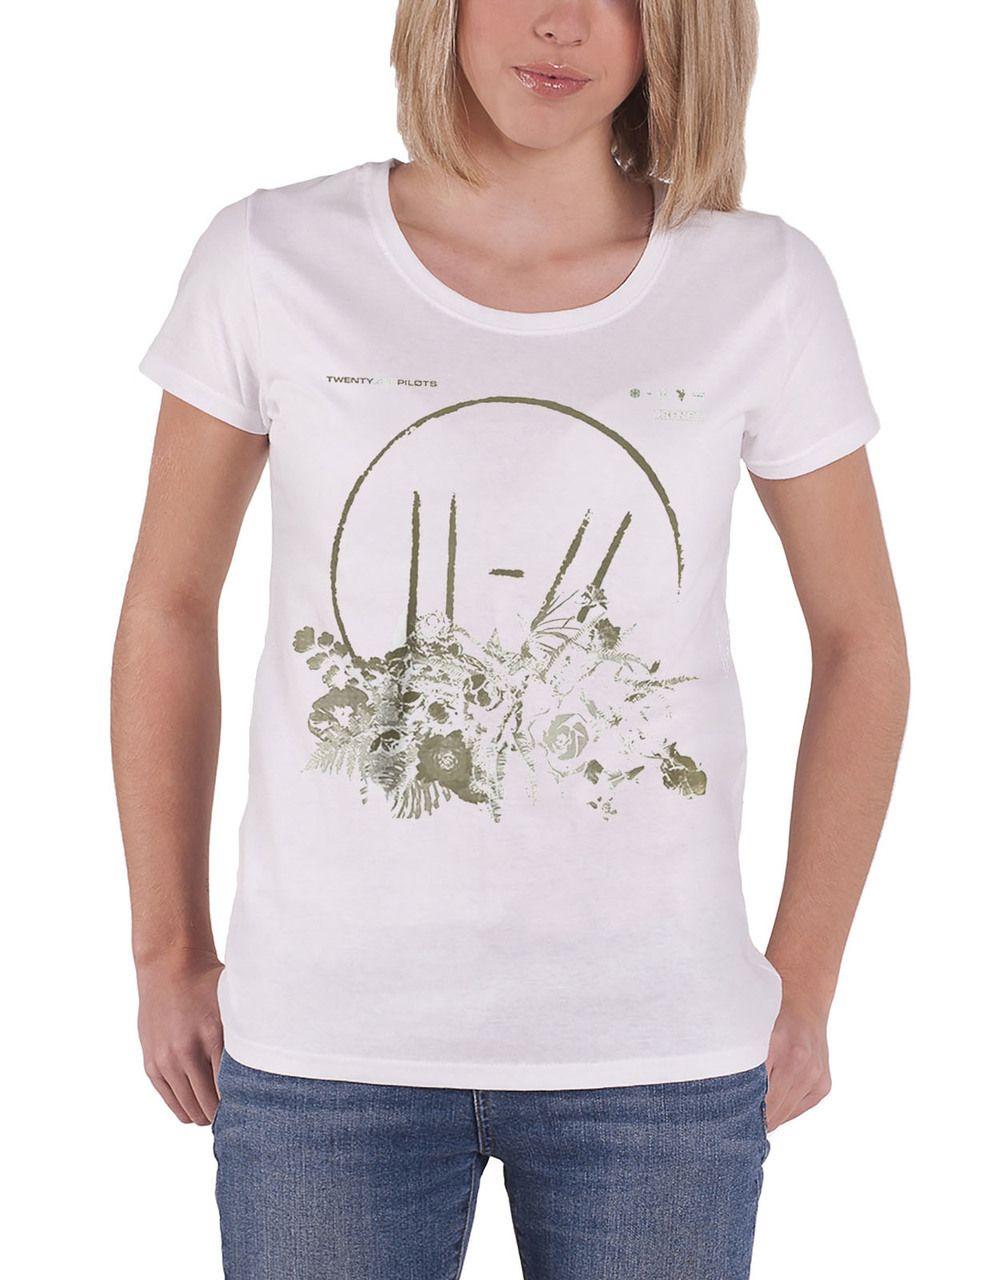 a1e7beb1b Twenty One Pilots T Shirt Trench Flower Bed Womens White - Paradiso Clothing